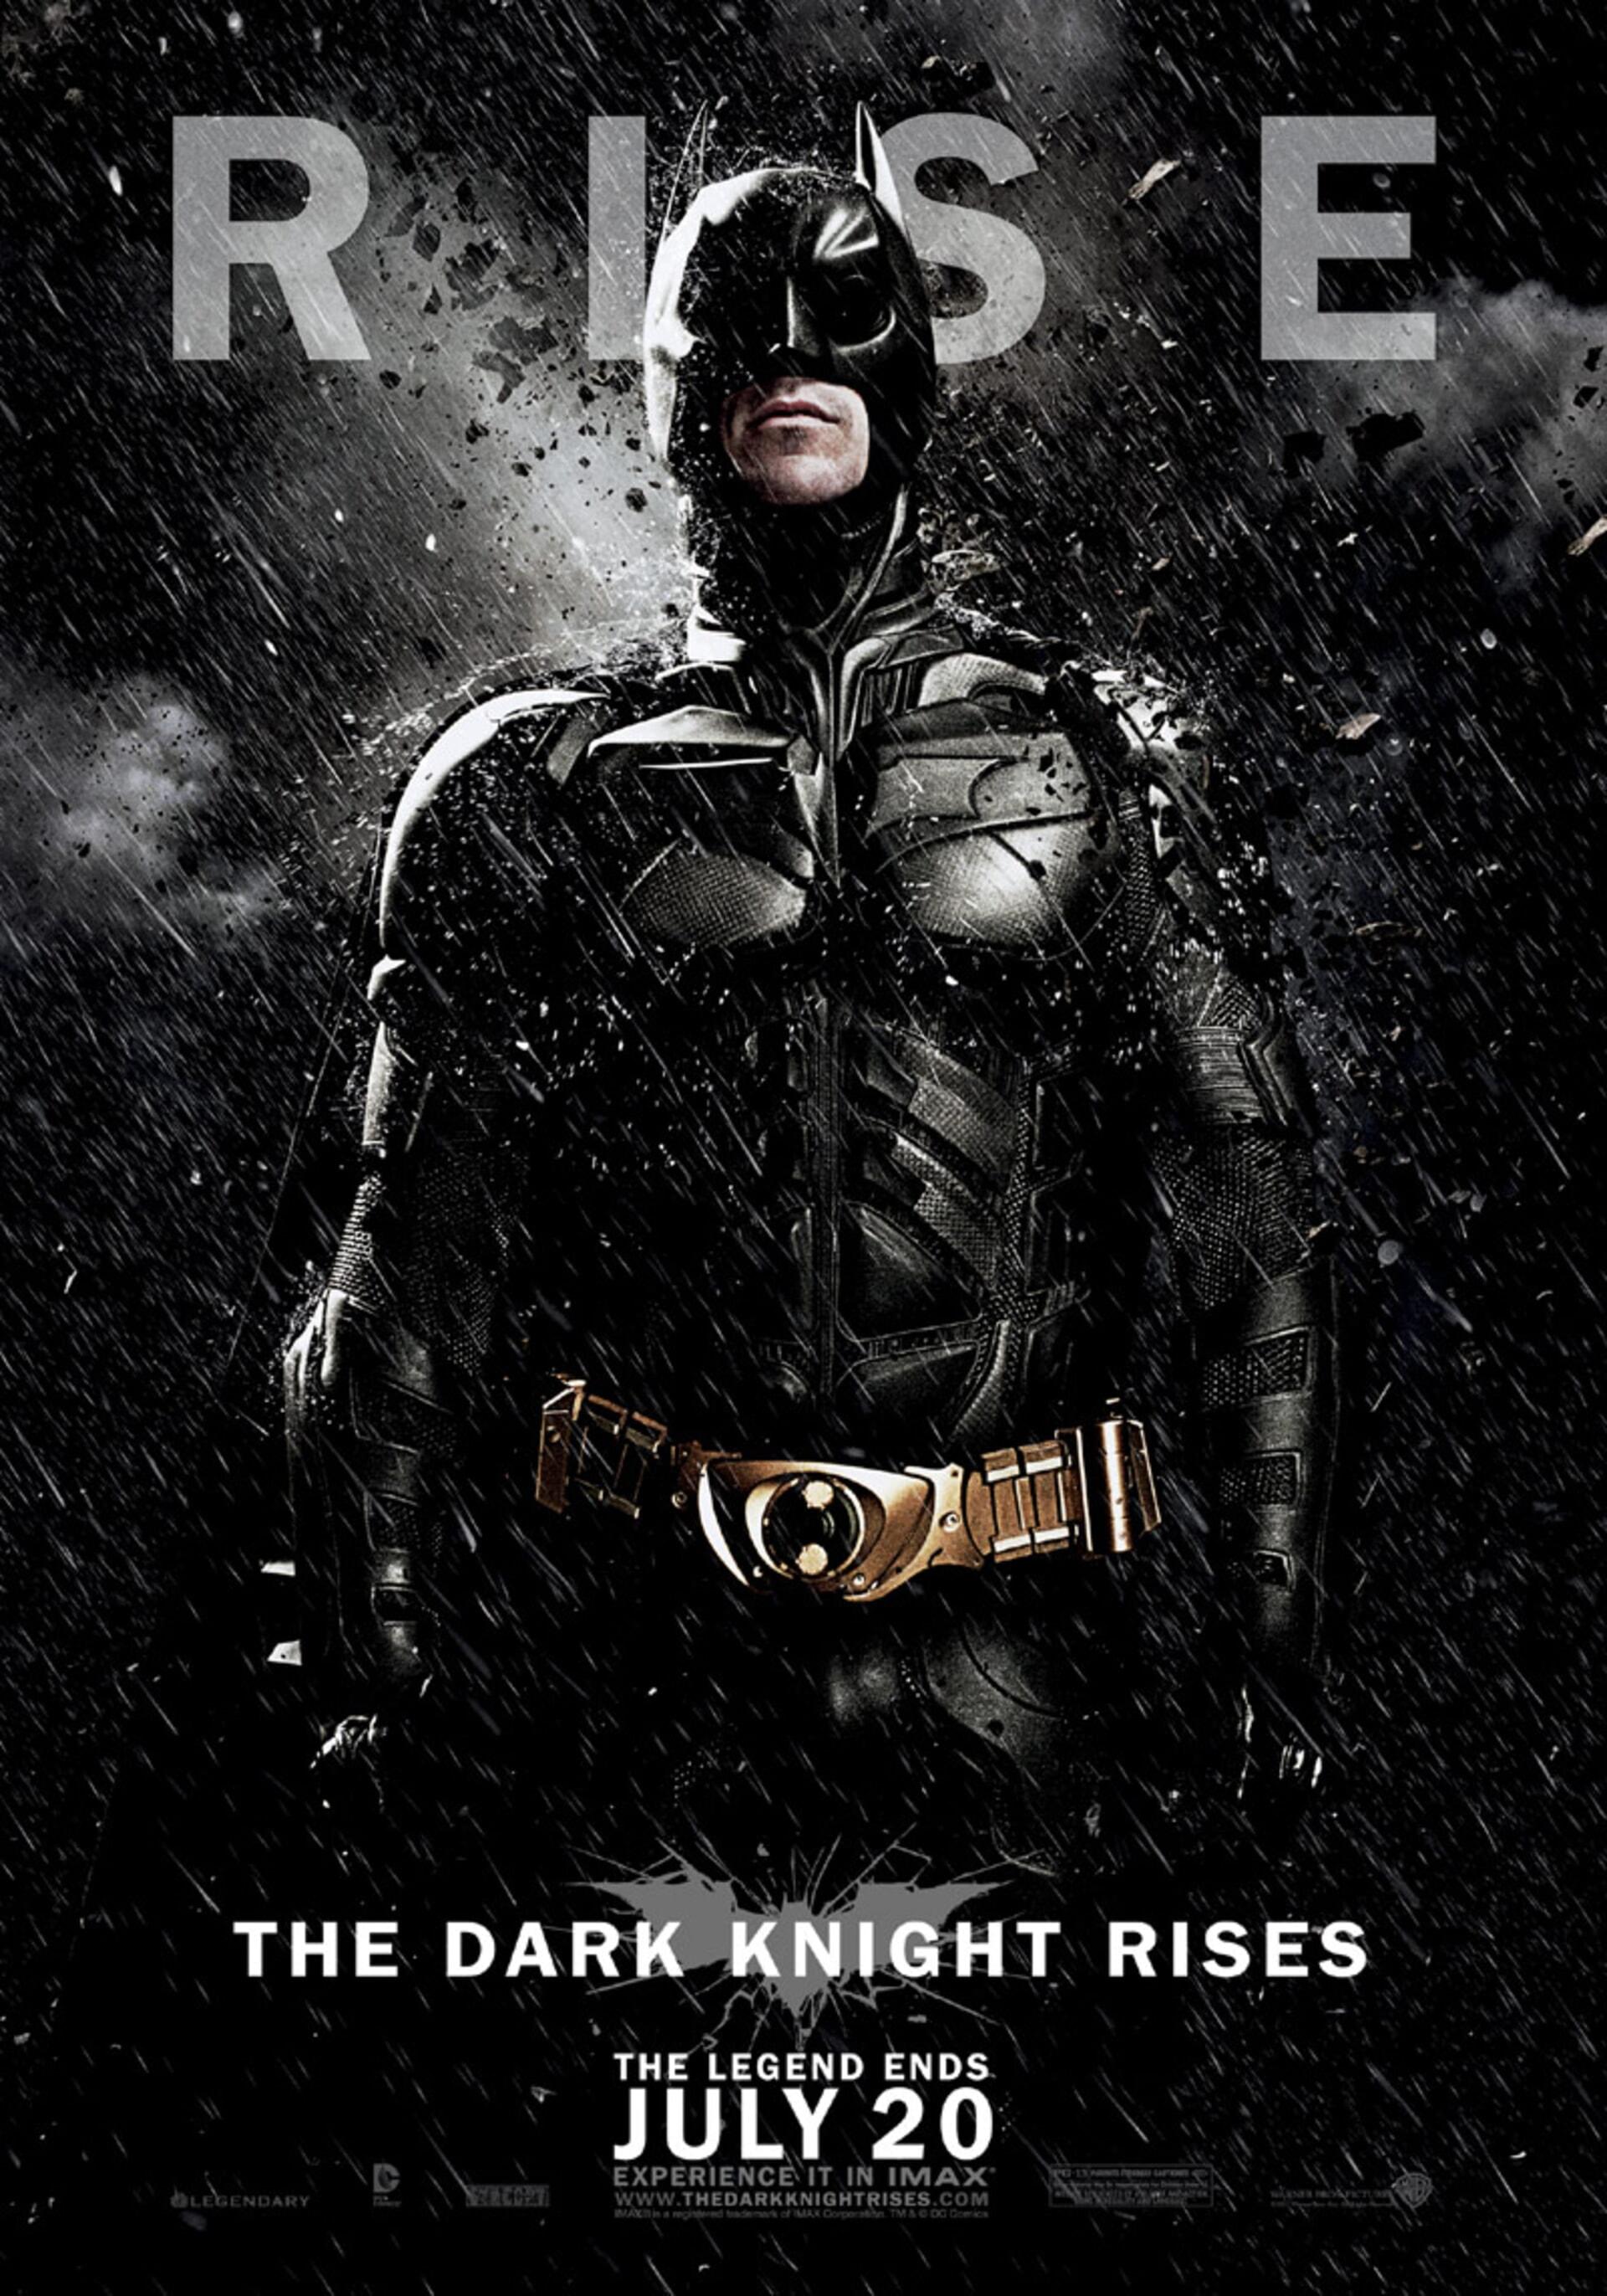 The Dark Knight Rises - Poster 4